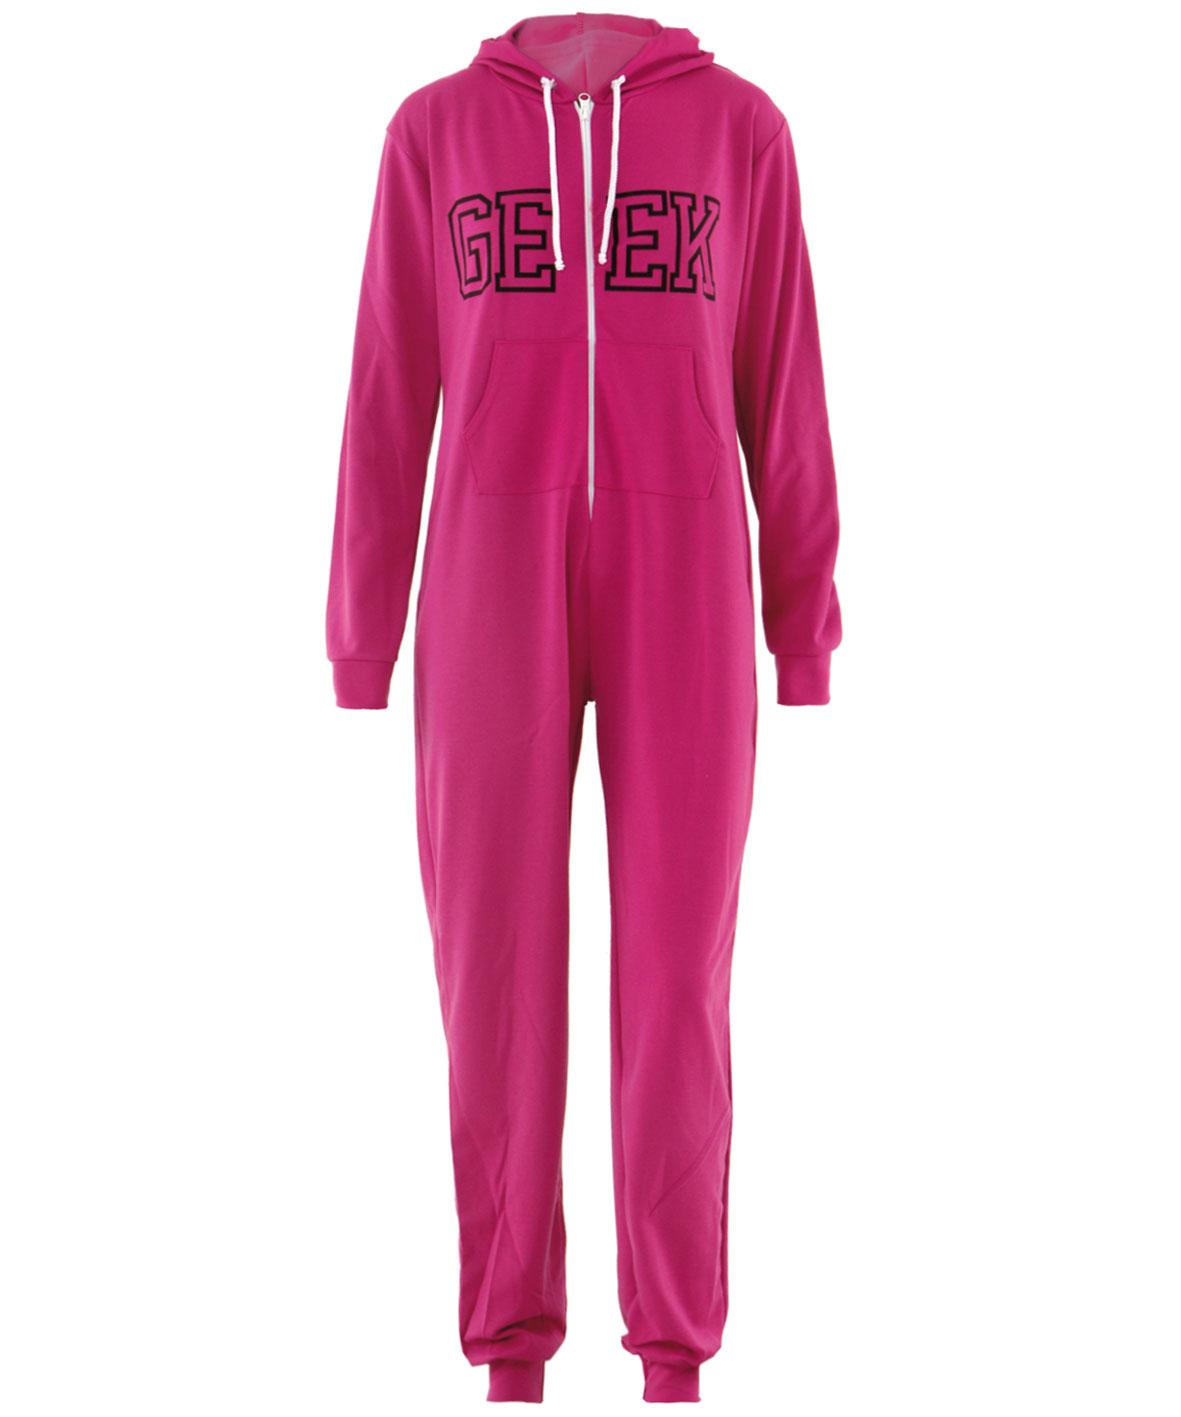 overall damen hausanzug kapuzenoverall geek druck onsie jumpsuit gr e 36 42 ebay. Black Bedroom Furniture Sets. Home Design Ideas